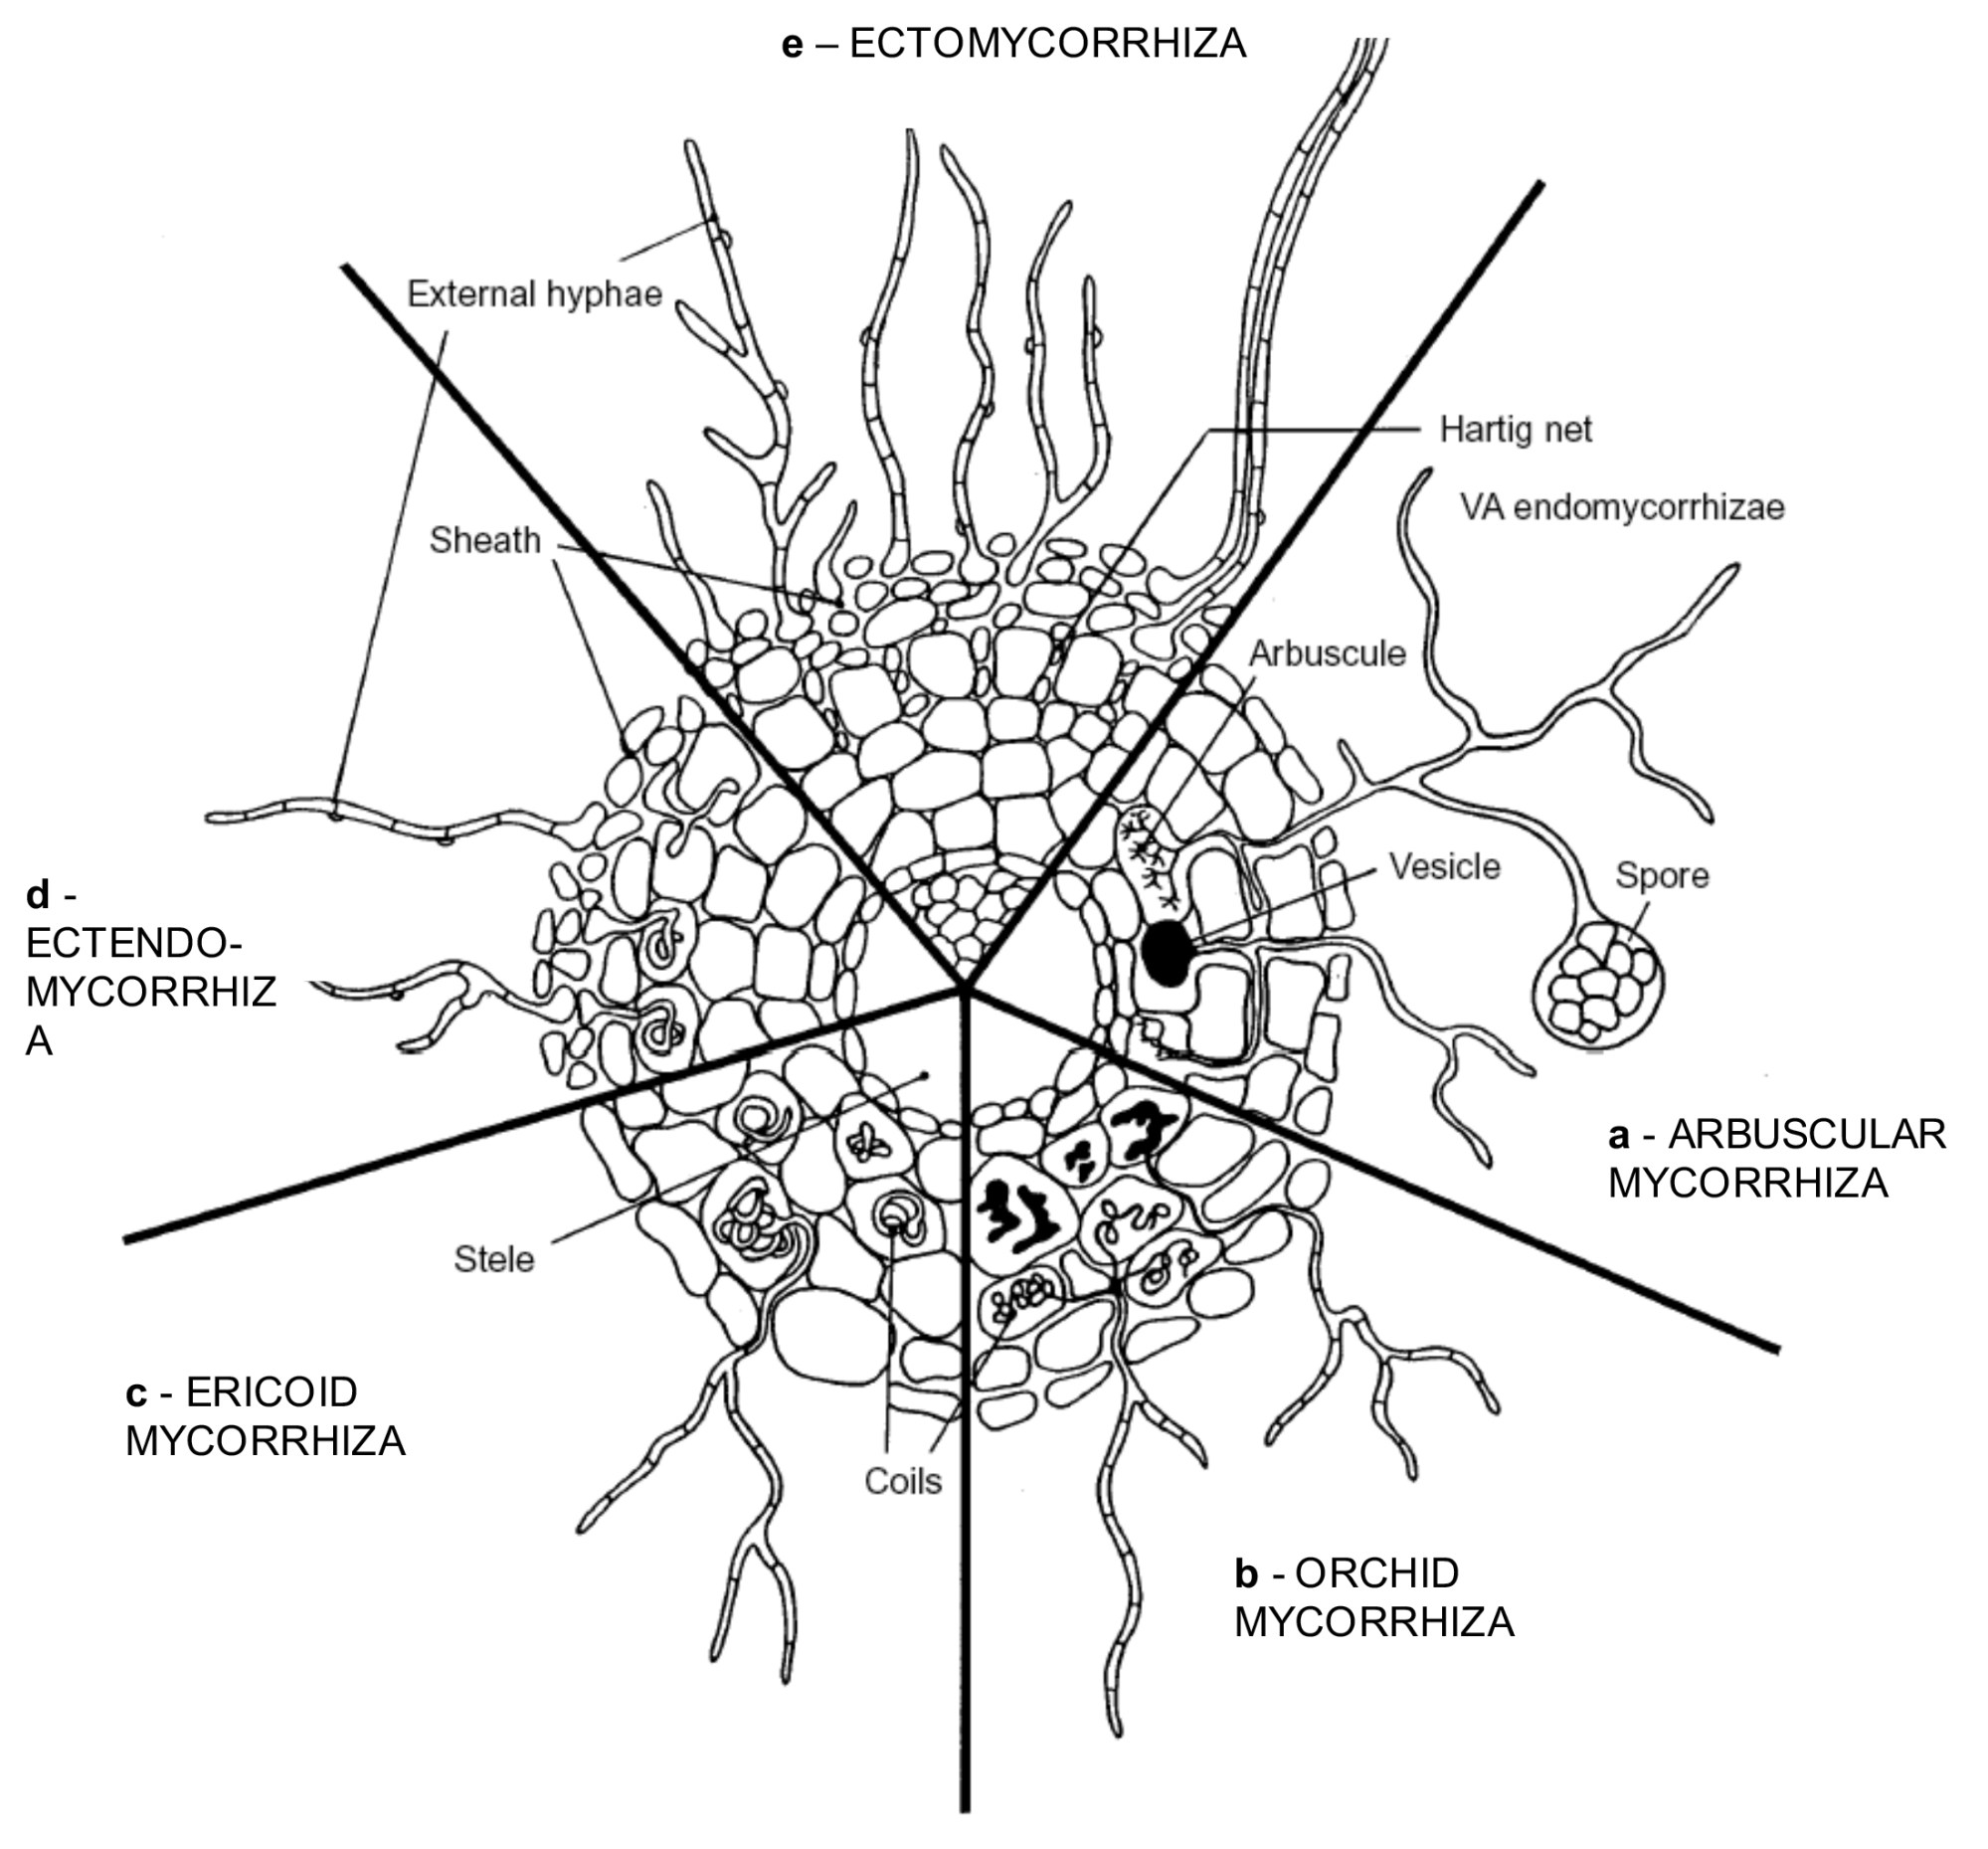 hight resolution of main types of extant mycorhizae